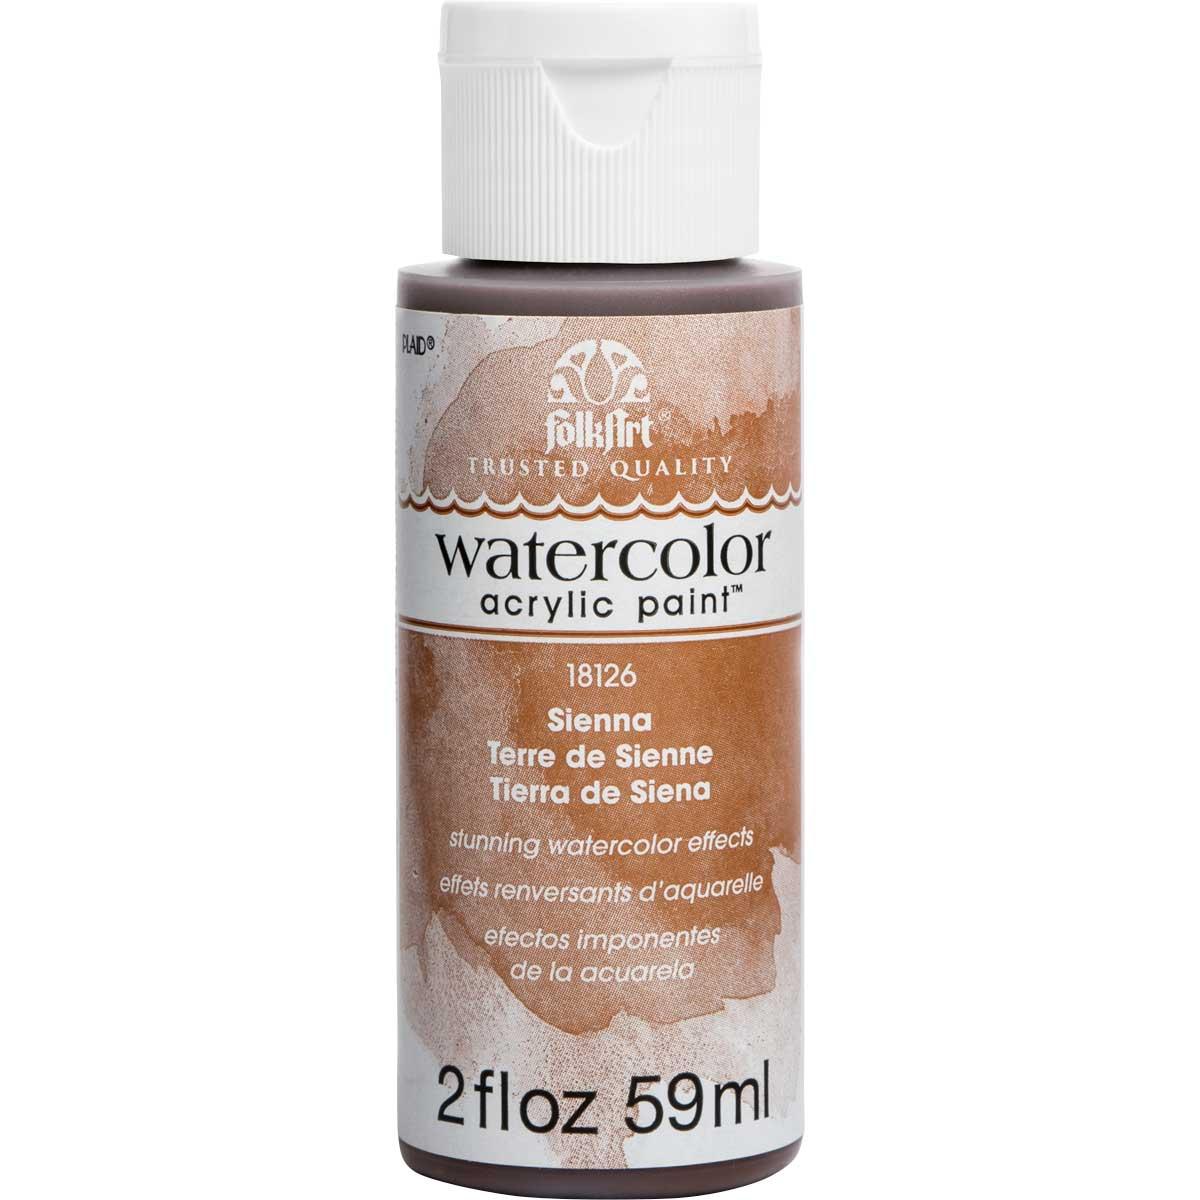 FolkArt ® Watercolor Acrylic Paint™ - Sienna, 2 oz. - 18126